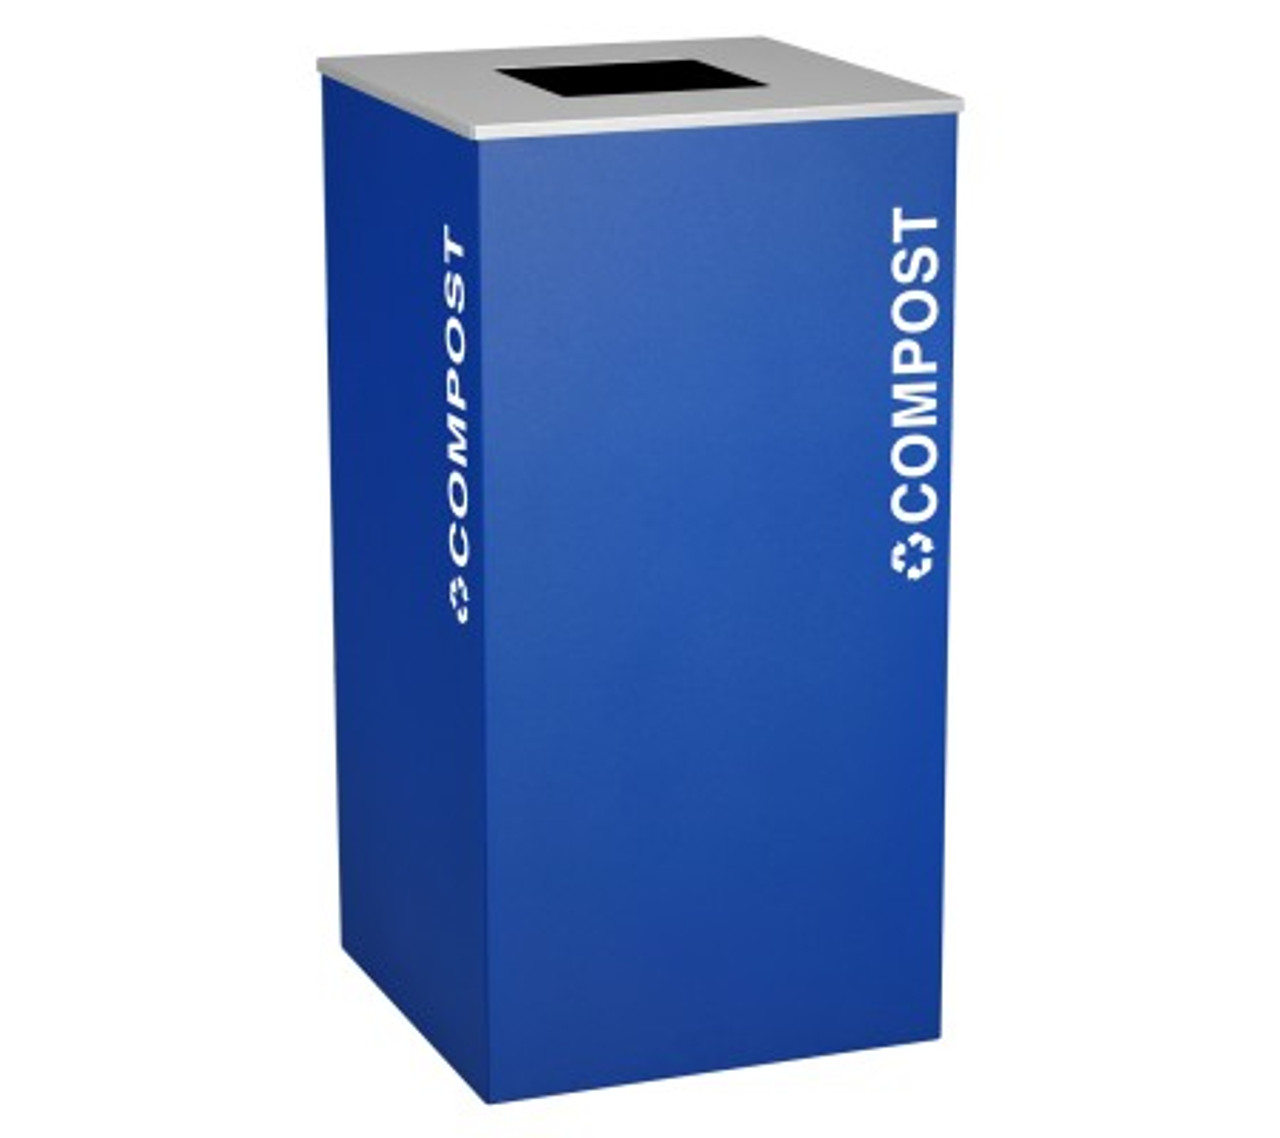 24 Gallon Compost Bin Square Steel Food Waste Can RC-KDSQ-T-COM Royal Blue